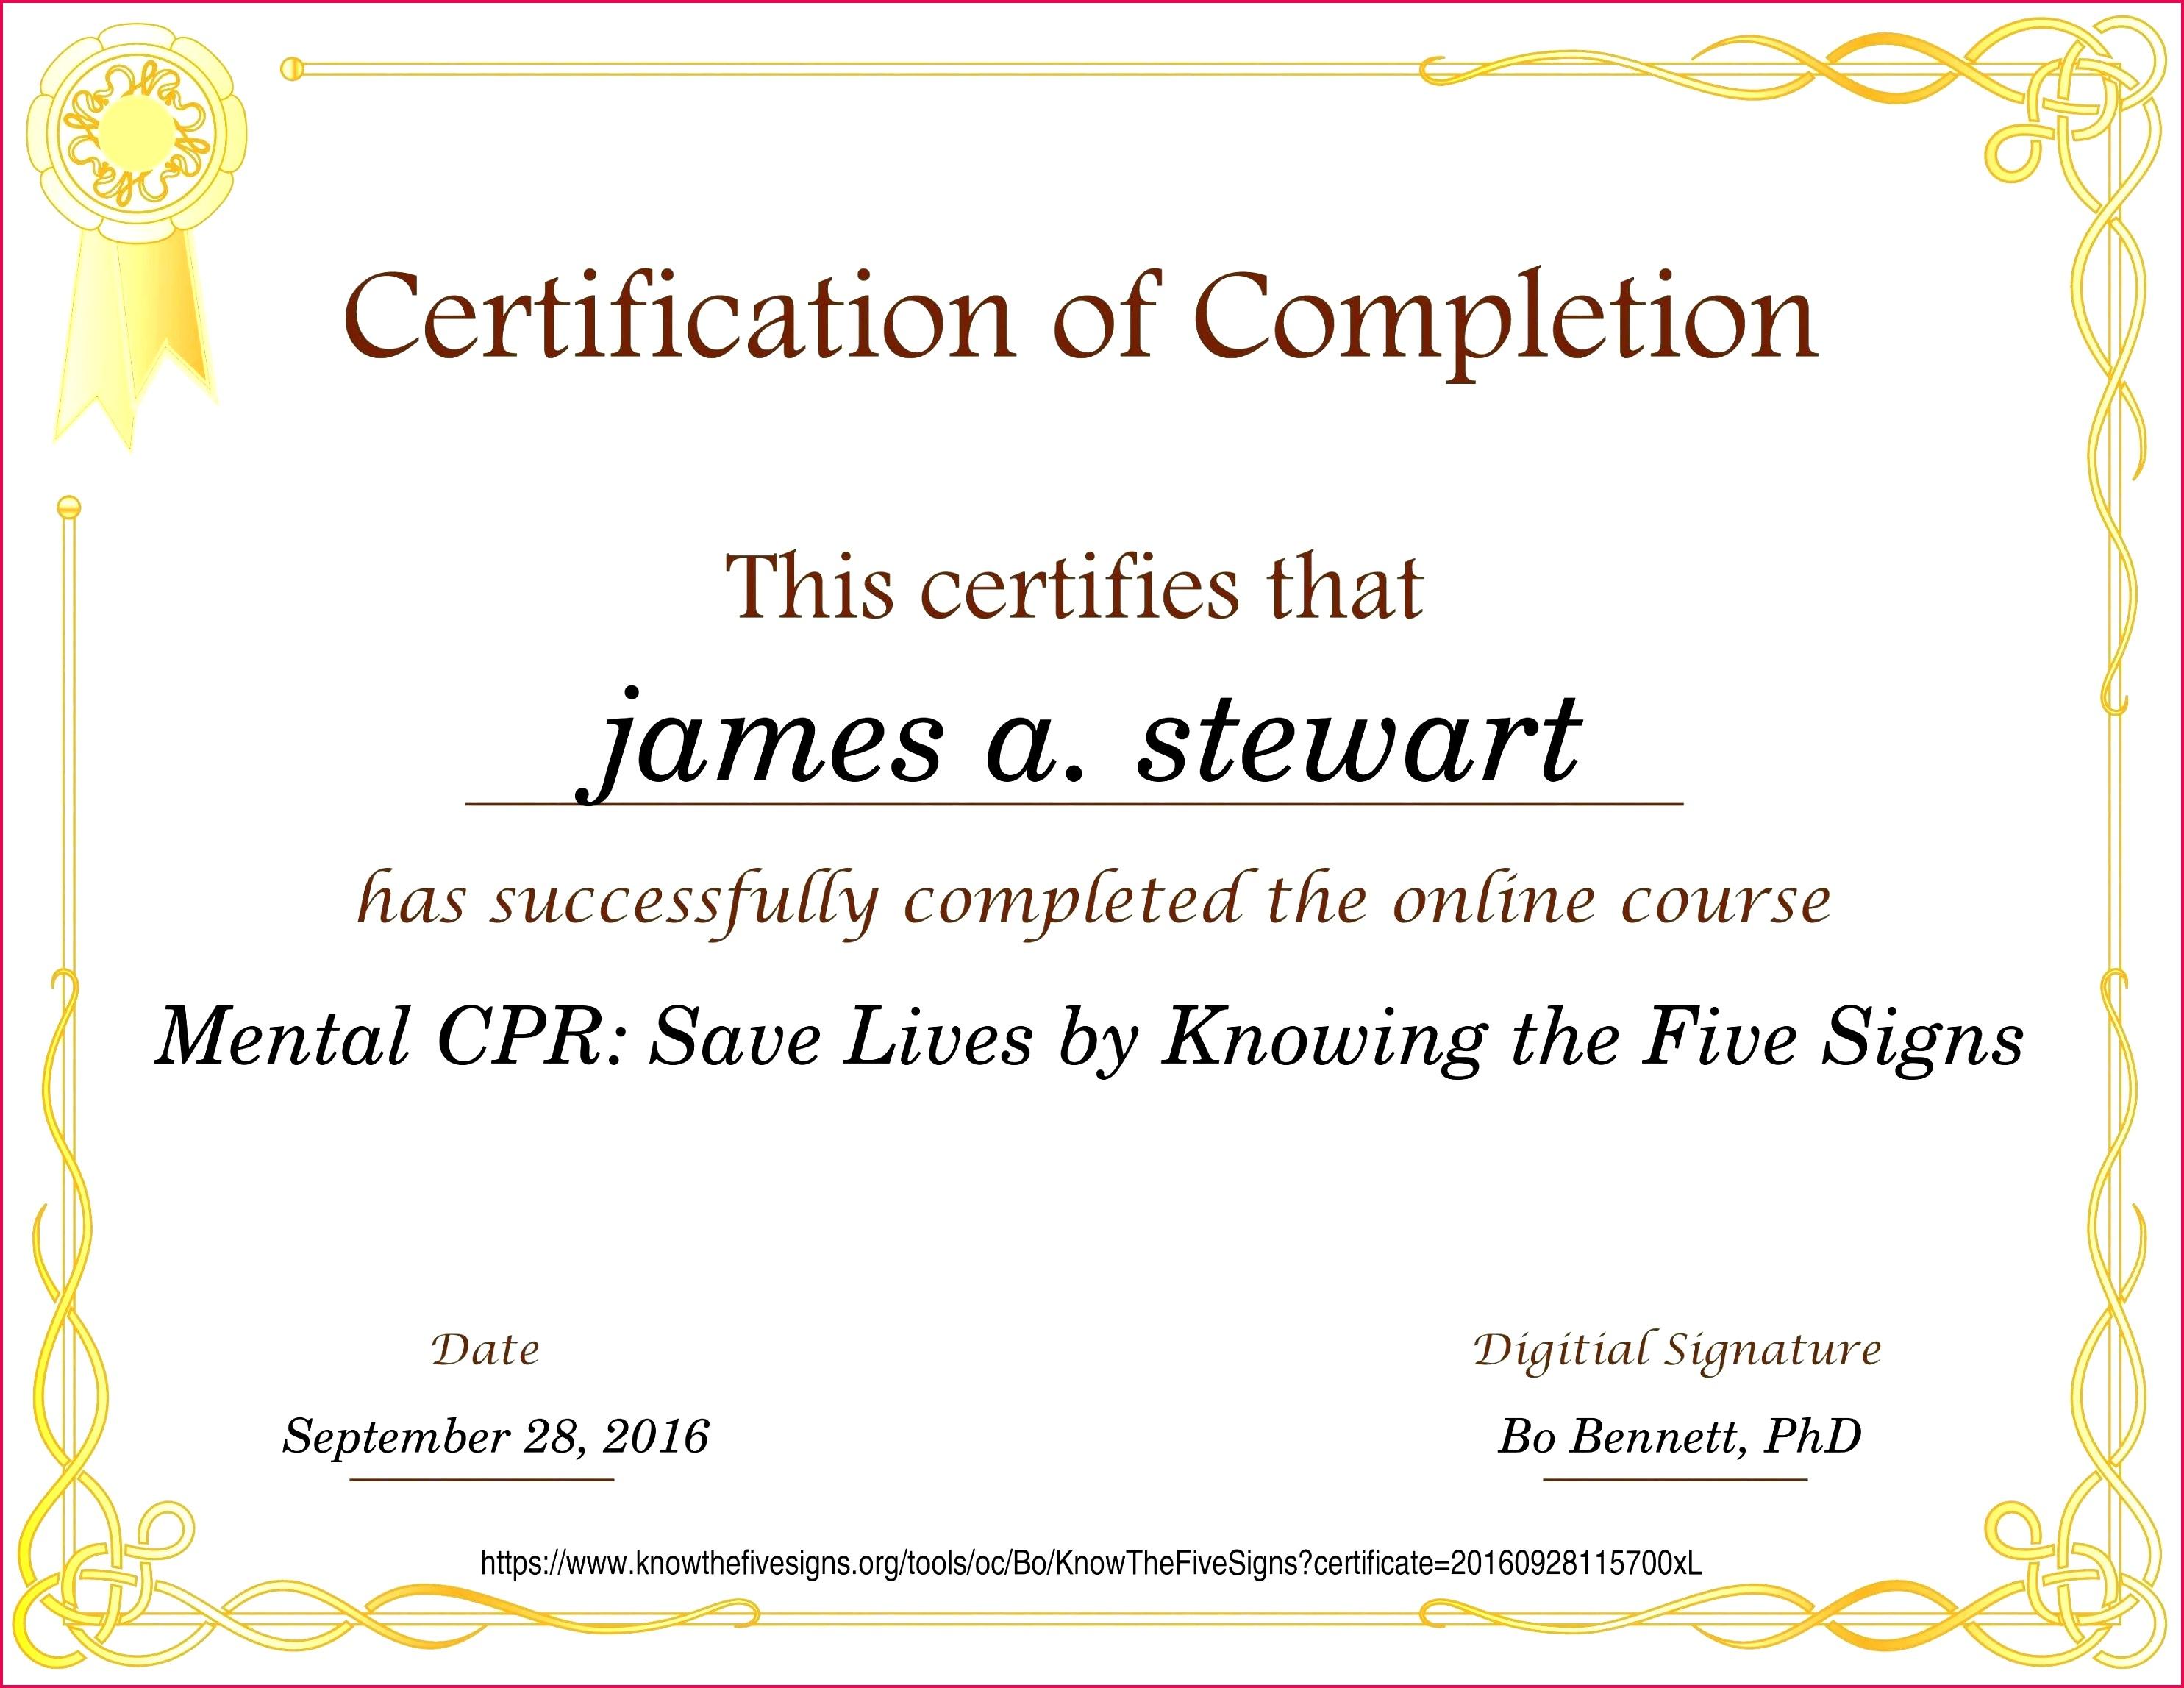 masonic certificate template free beautiful life membership certificate template canasrgdorfbib of masonic certificate template free